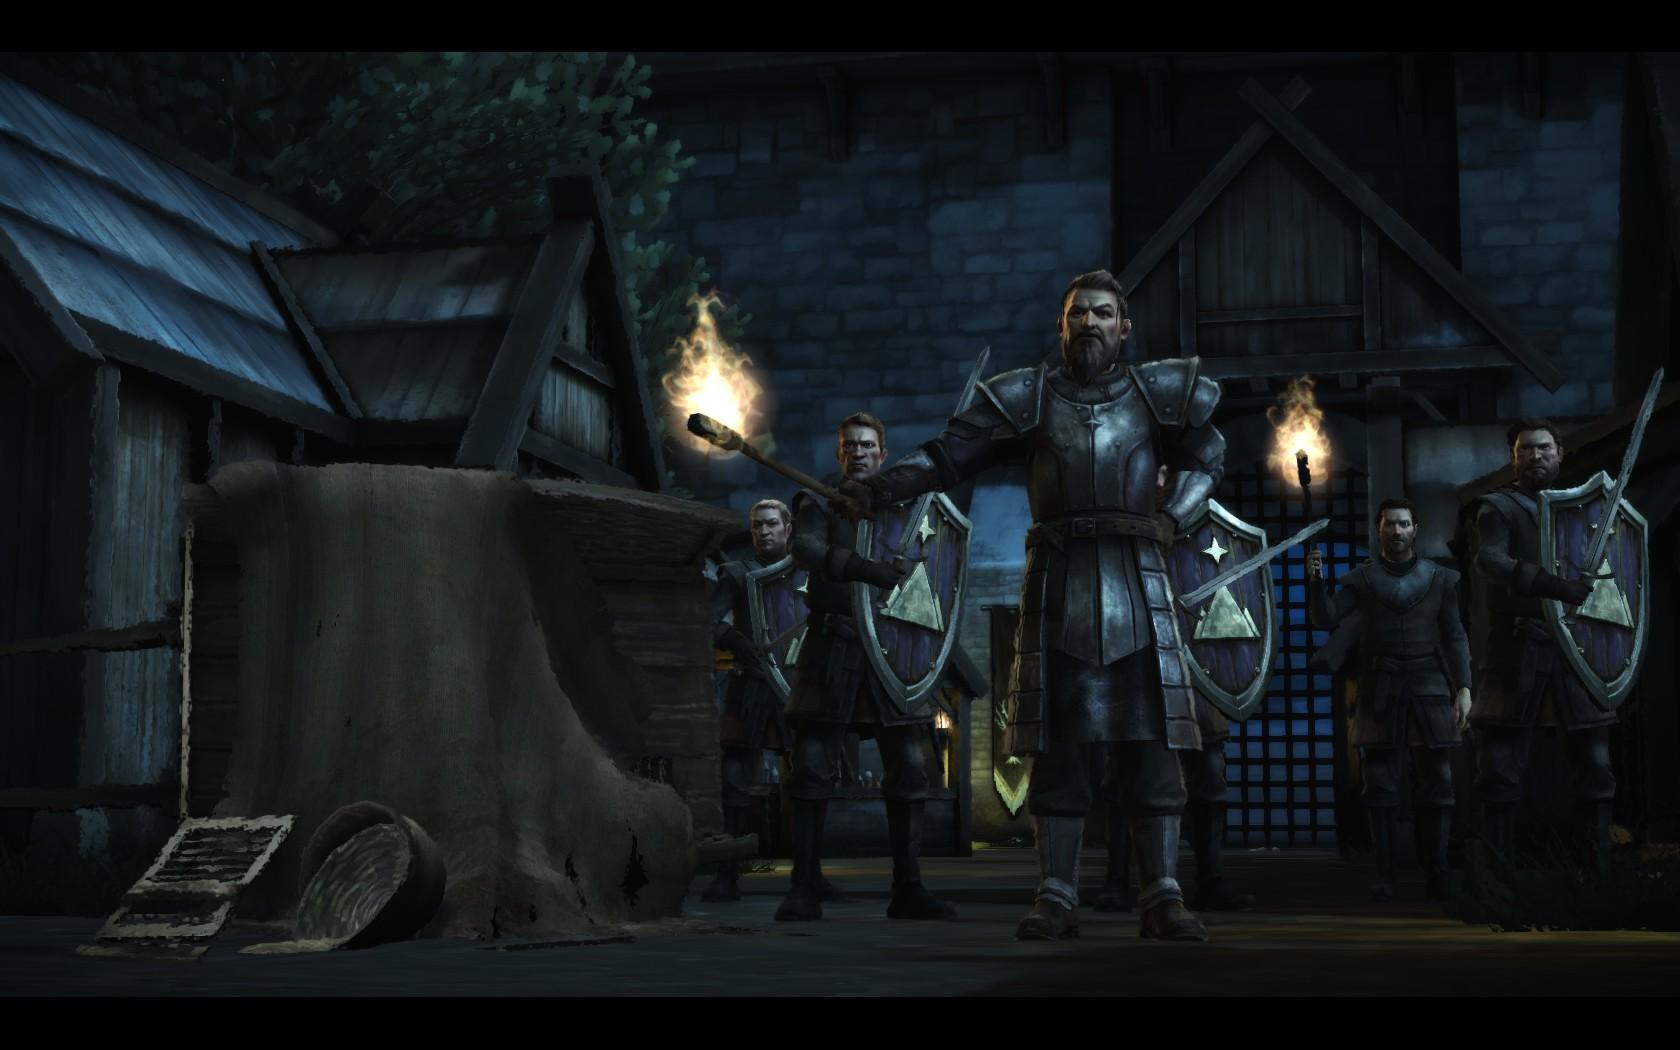 Game of Thrones: The Sword in the Darkness - ve stínu dračích křídel 107314